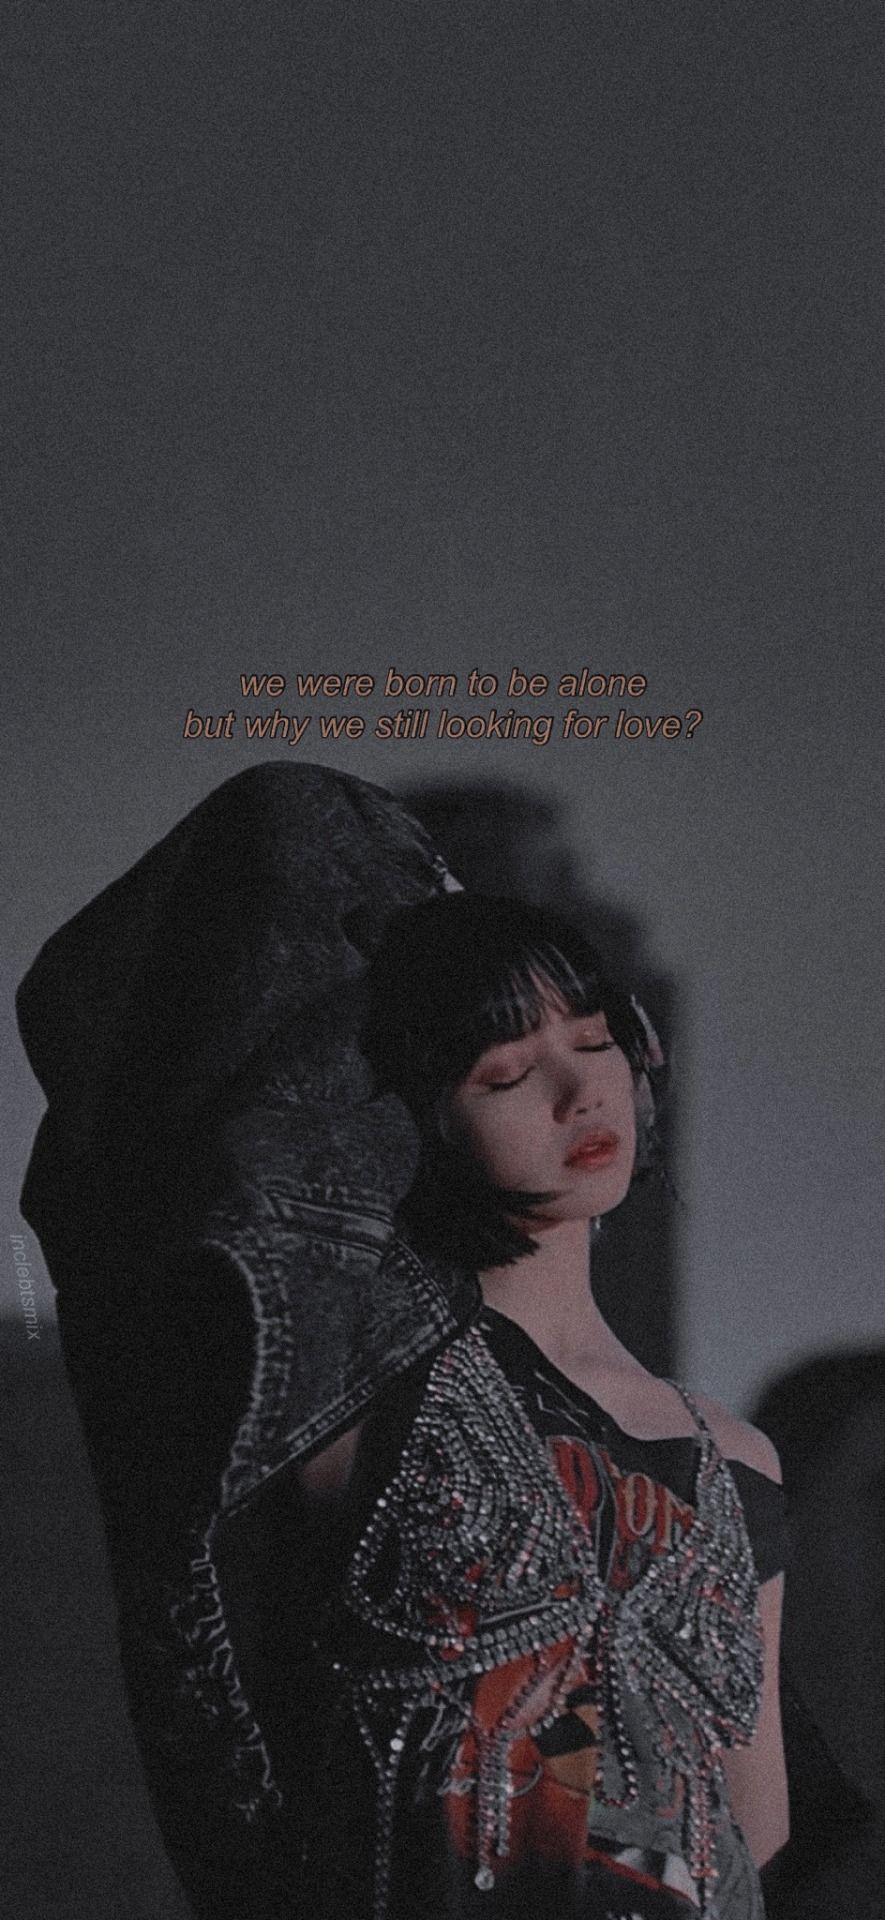 Blackpink Lovesick Girls Lyrics Lockscreens Lisa Blackpink Wallpaper Blackpink Lisa Blackpink